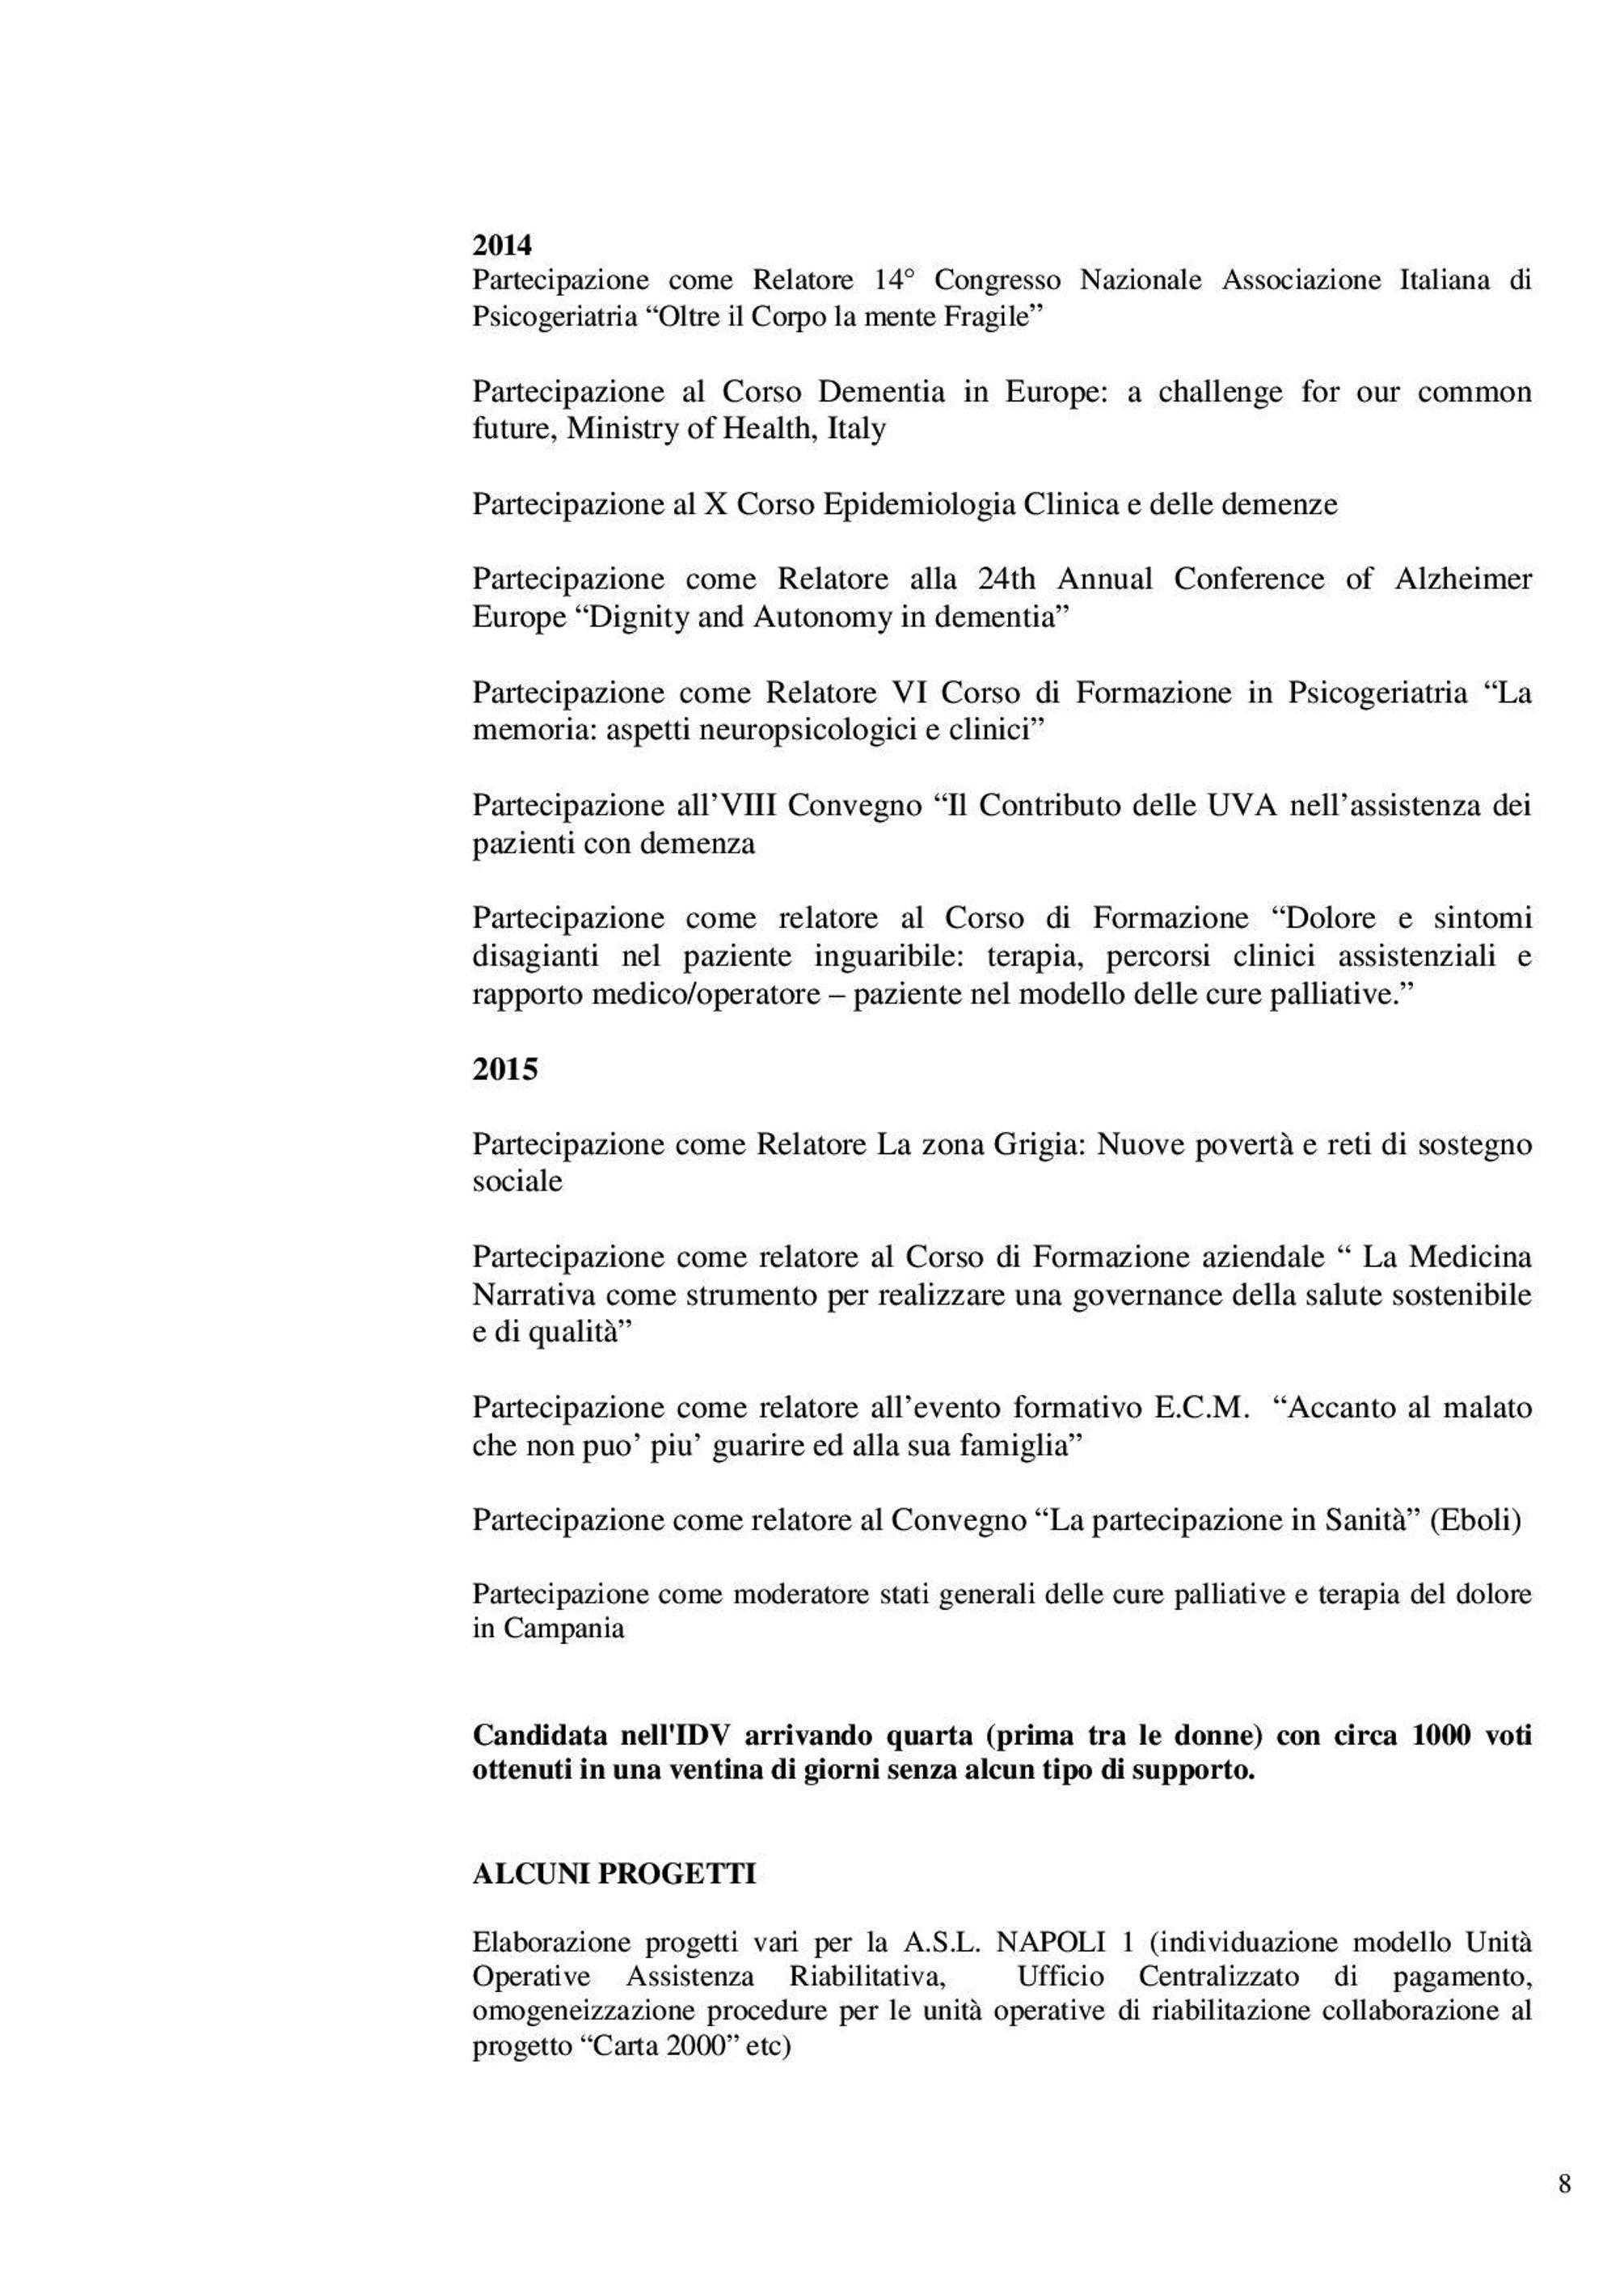 CUURICULUM MUSELLA FORMATO EUROPEO-page-008